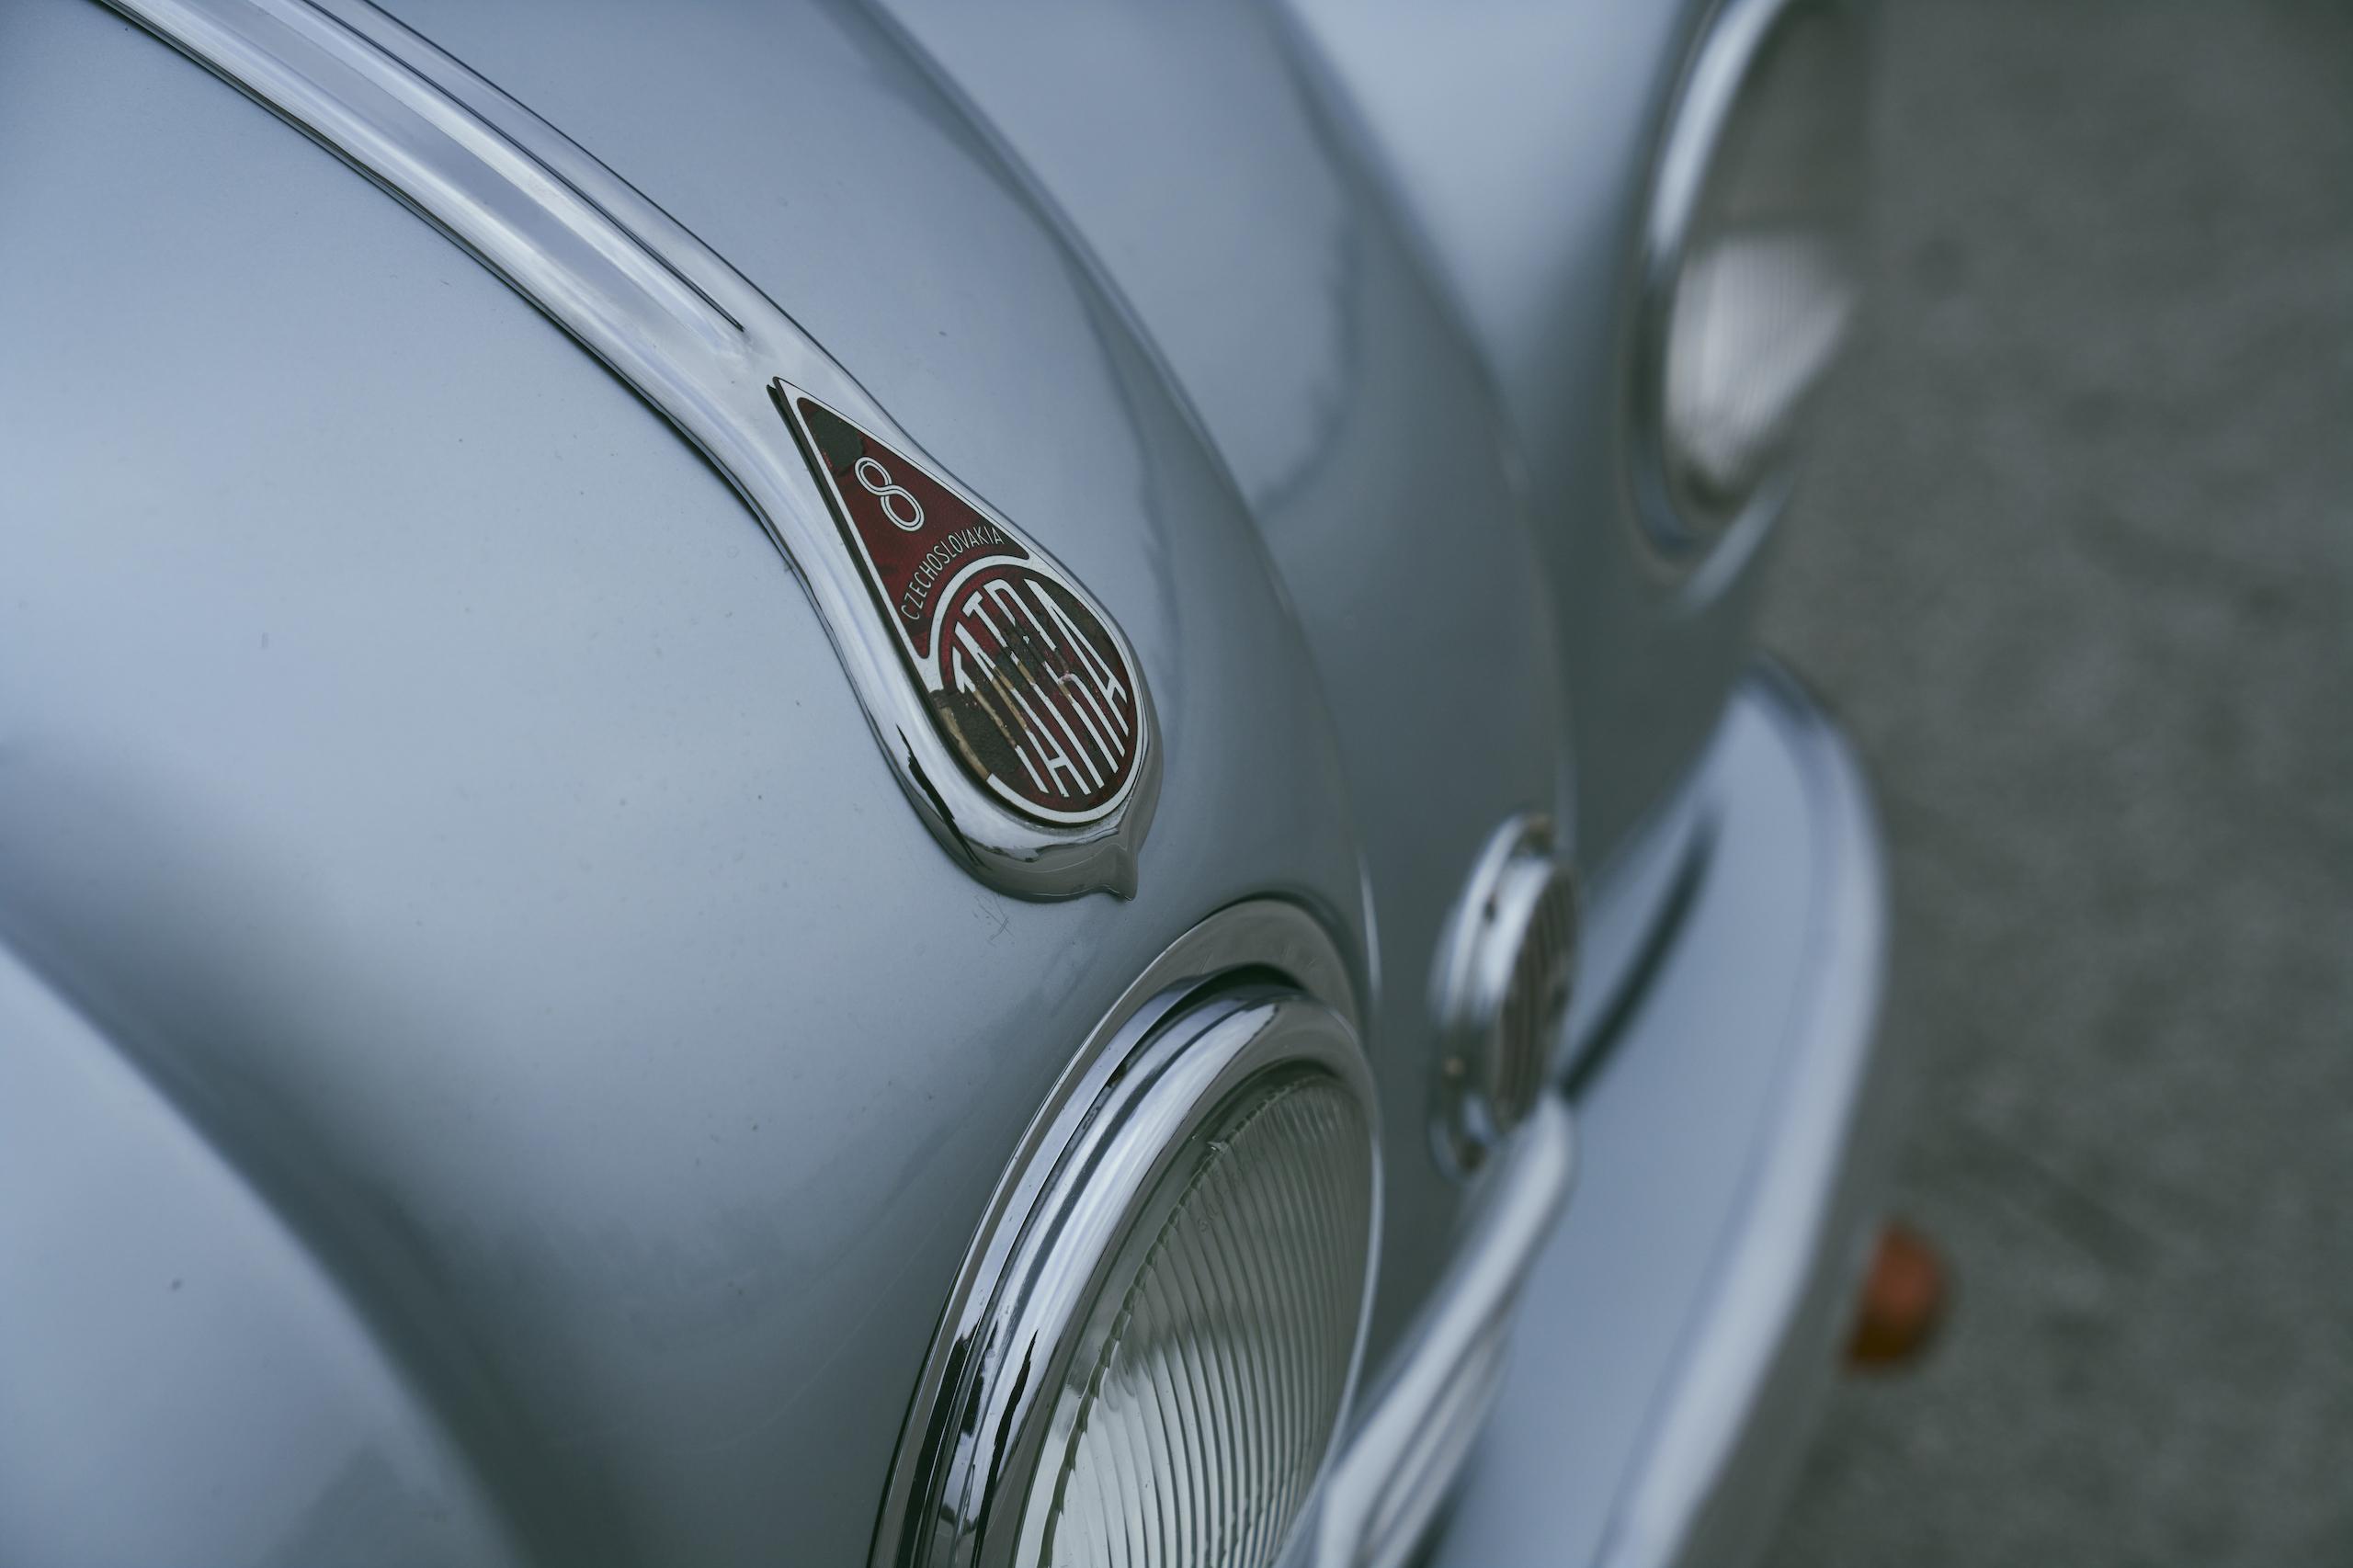 1947 Tatra T87 front badge